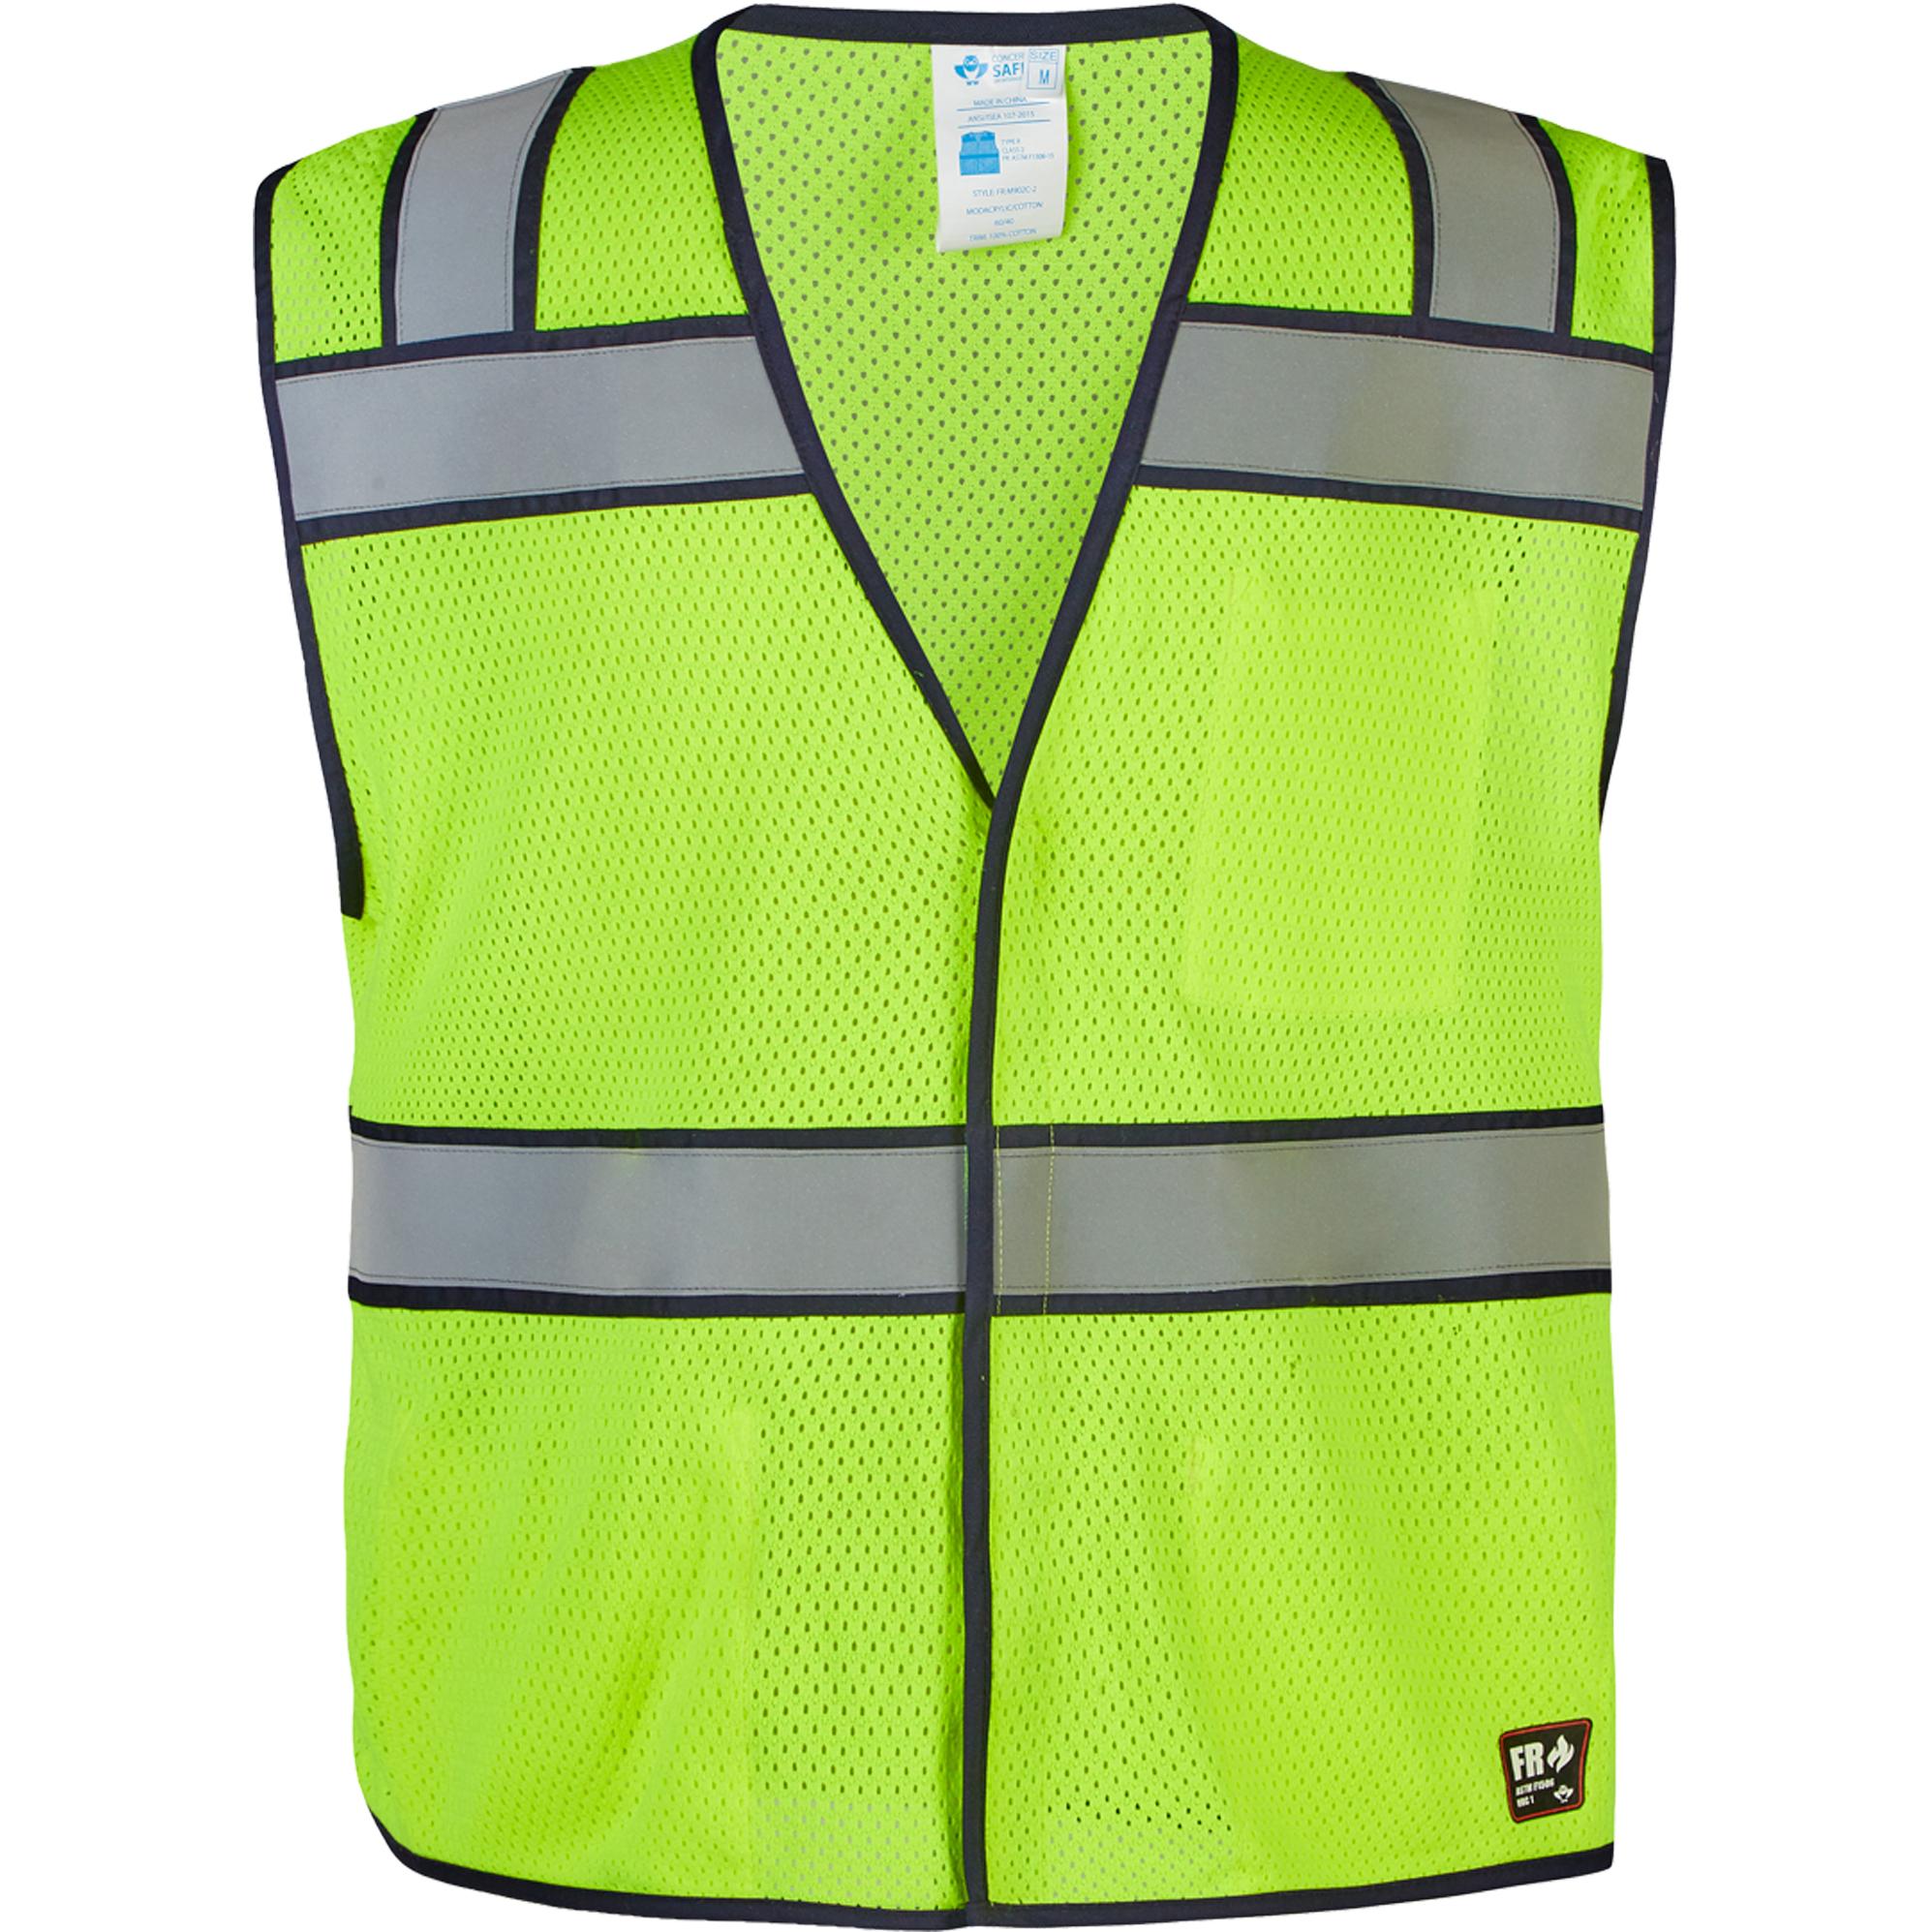 Fire Resistant Safety Vest-2W International